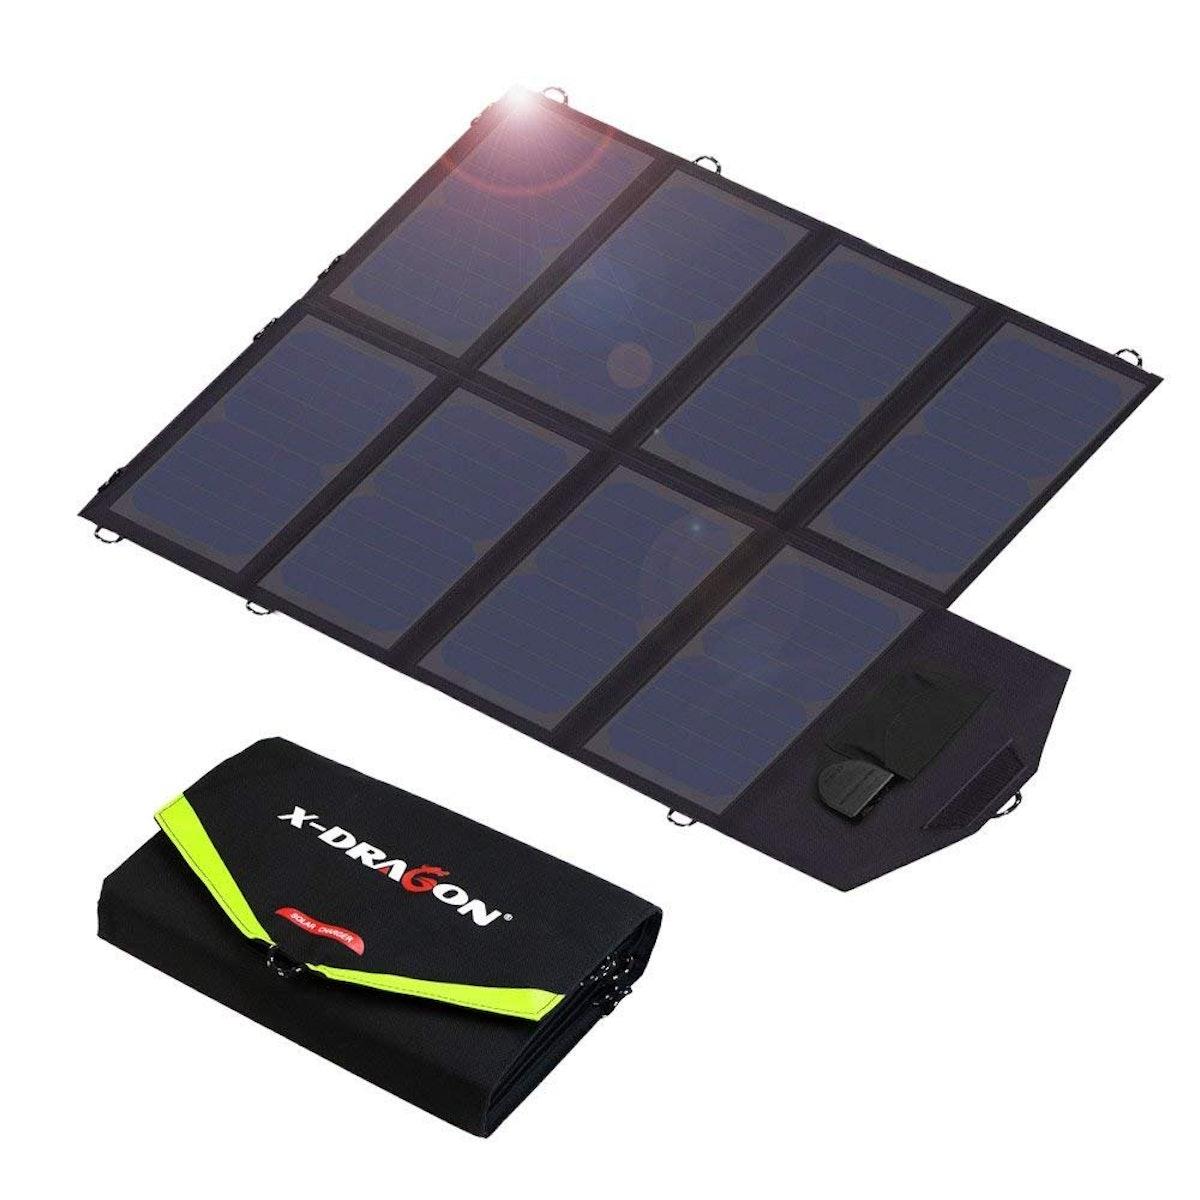 X-DRAGON Solar Charger